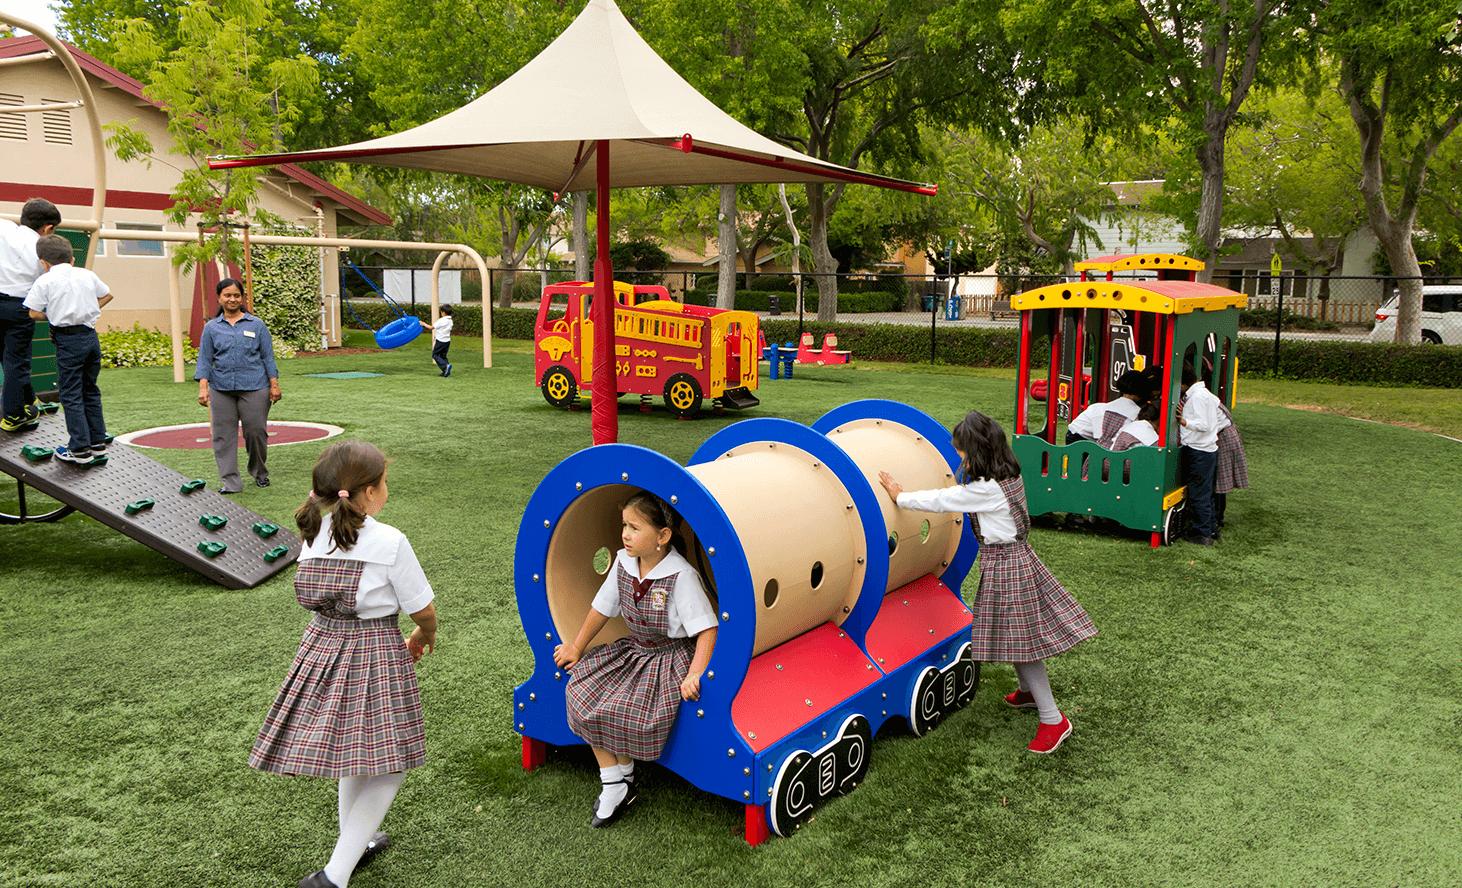 Preschool Playground | Challenger School - Middlefield | Private School In Palo Alto, California